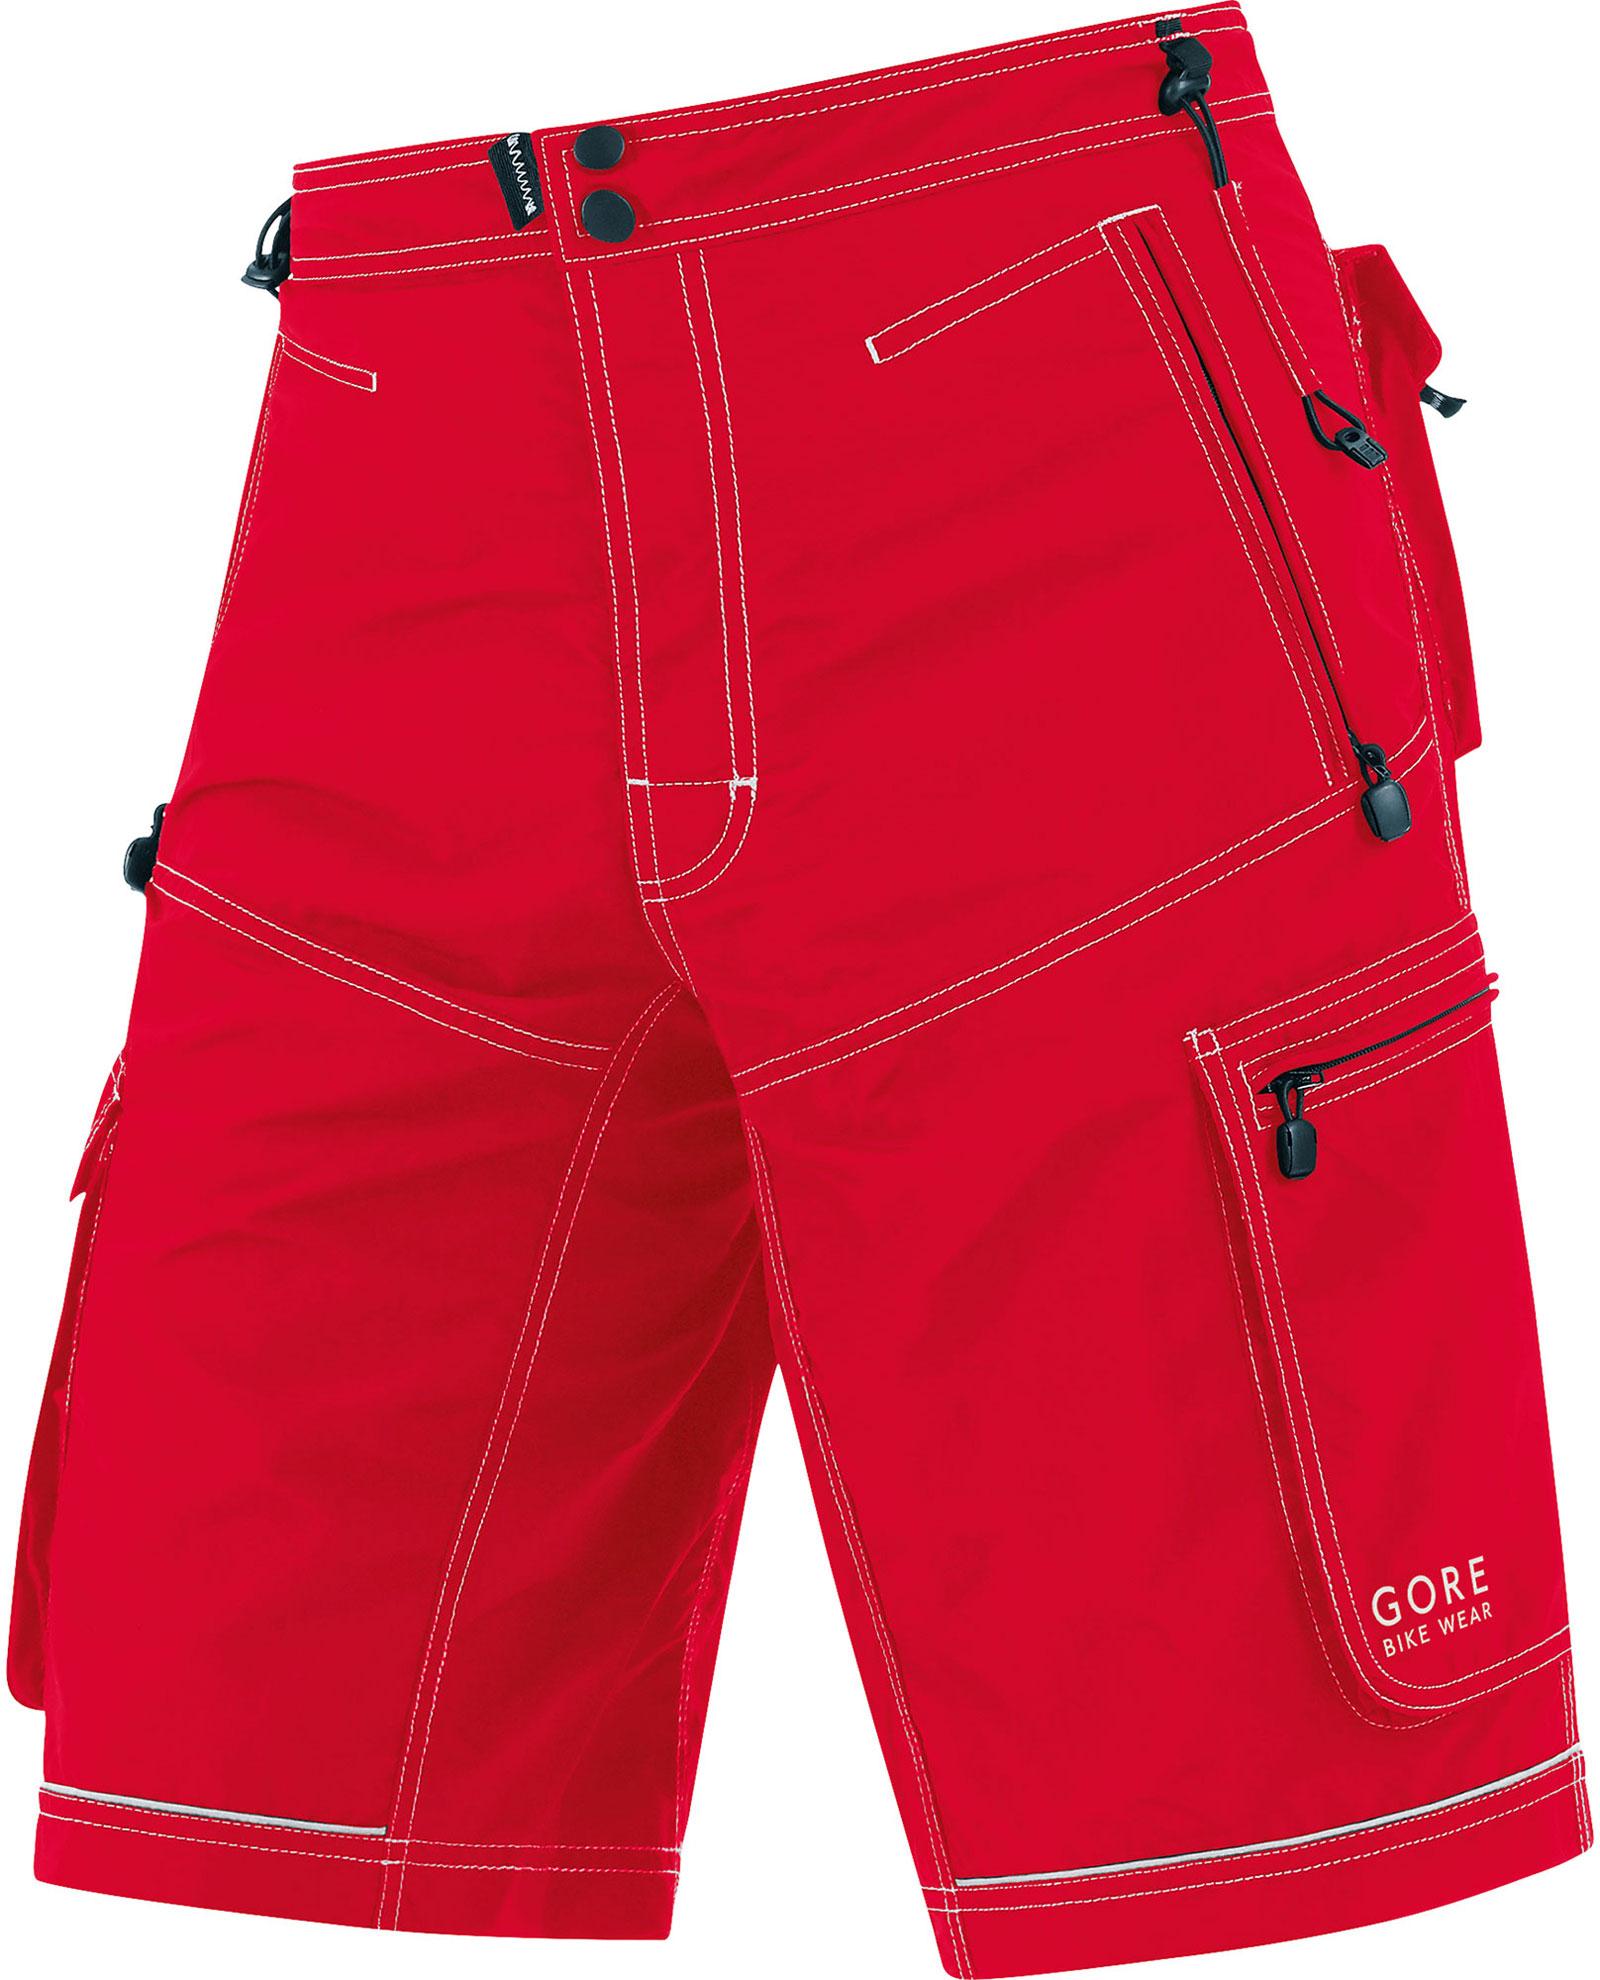 Gore Wear Plaster Ultra Shorts Bikeland Barrie S